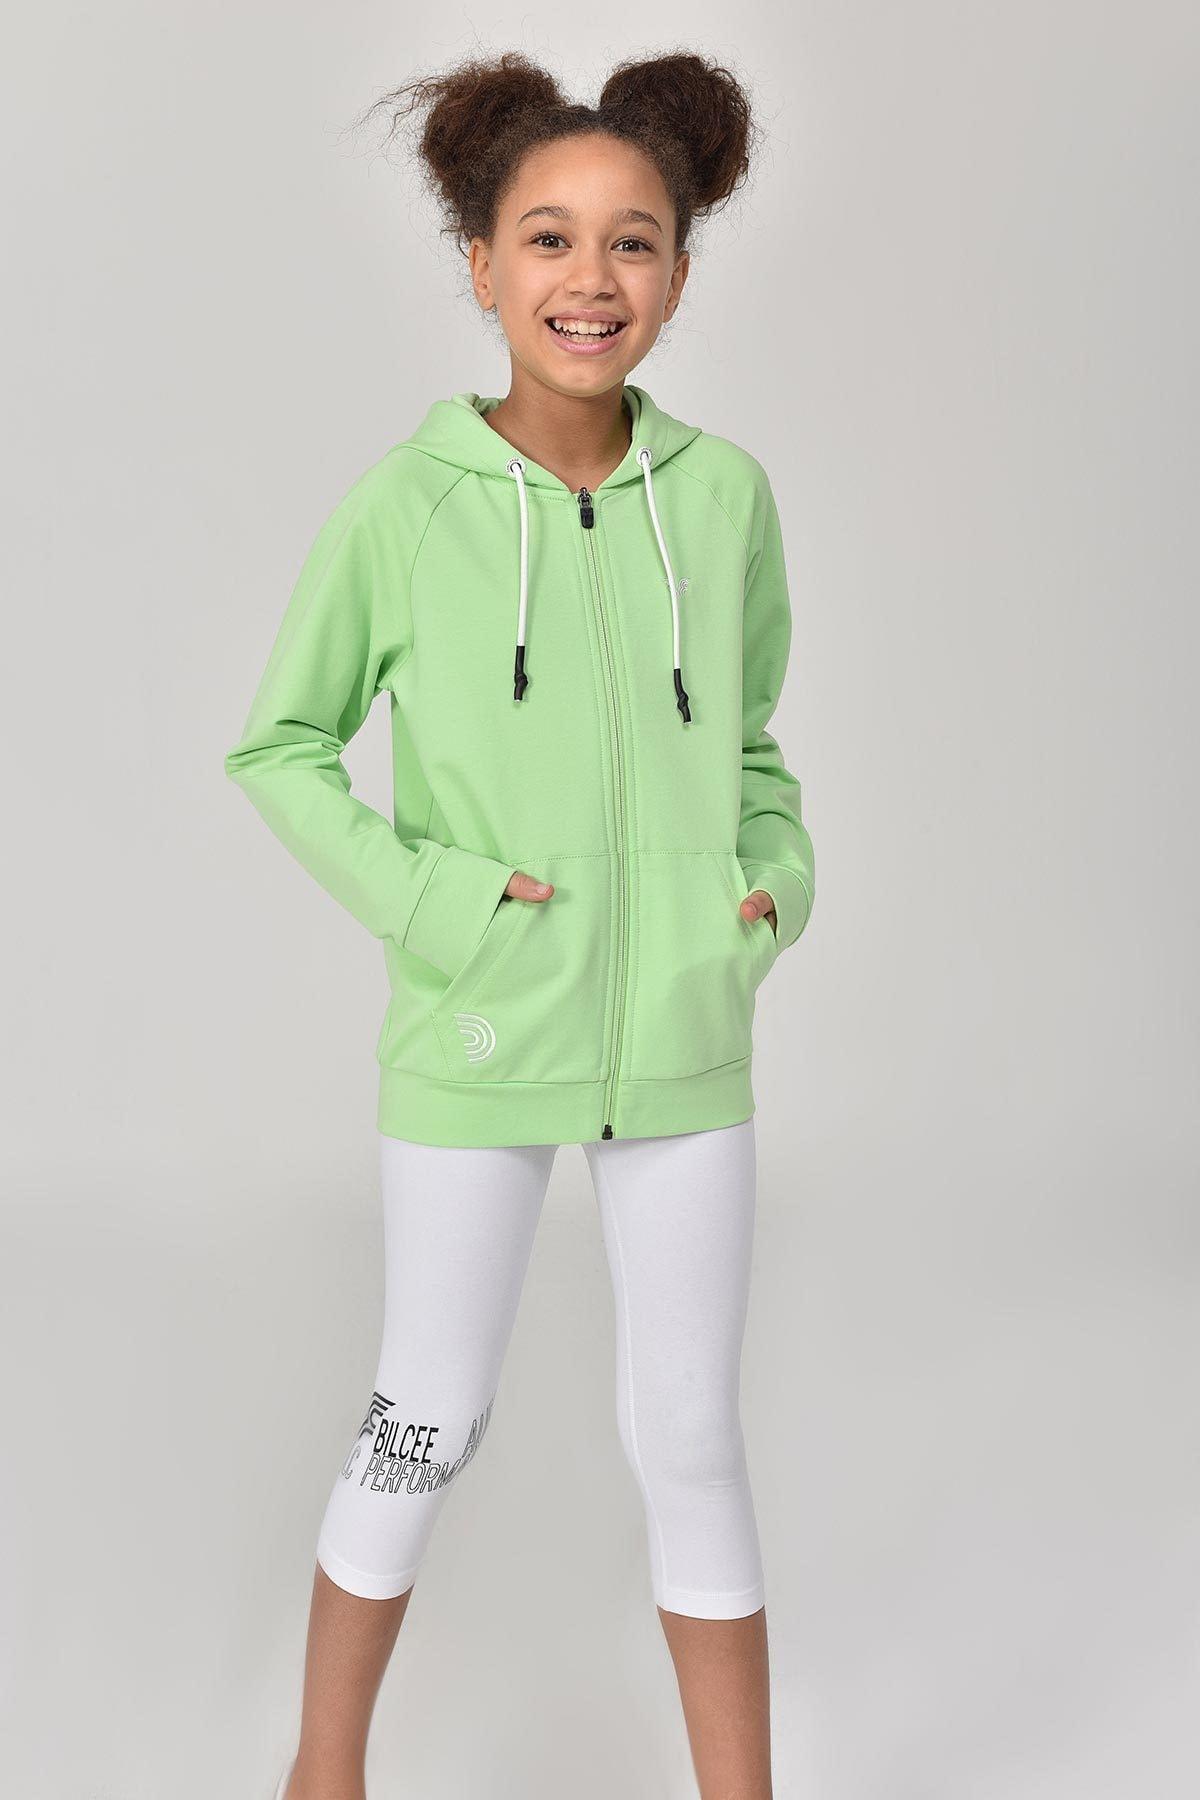 bilcee A.Yeşil Unisex Çocuk Eşofman Üstü GS-8195 1